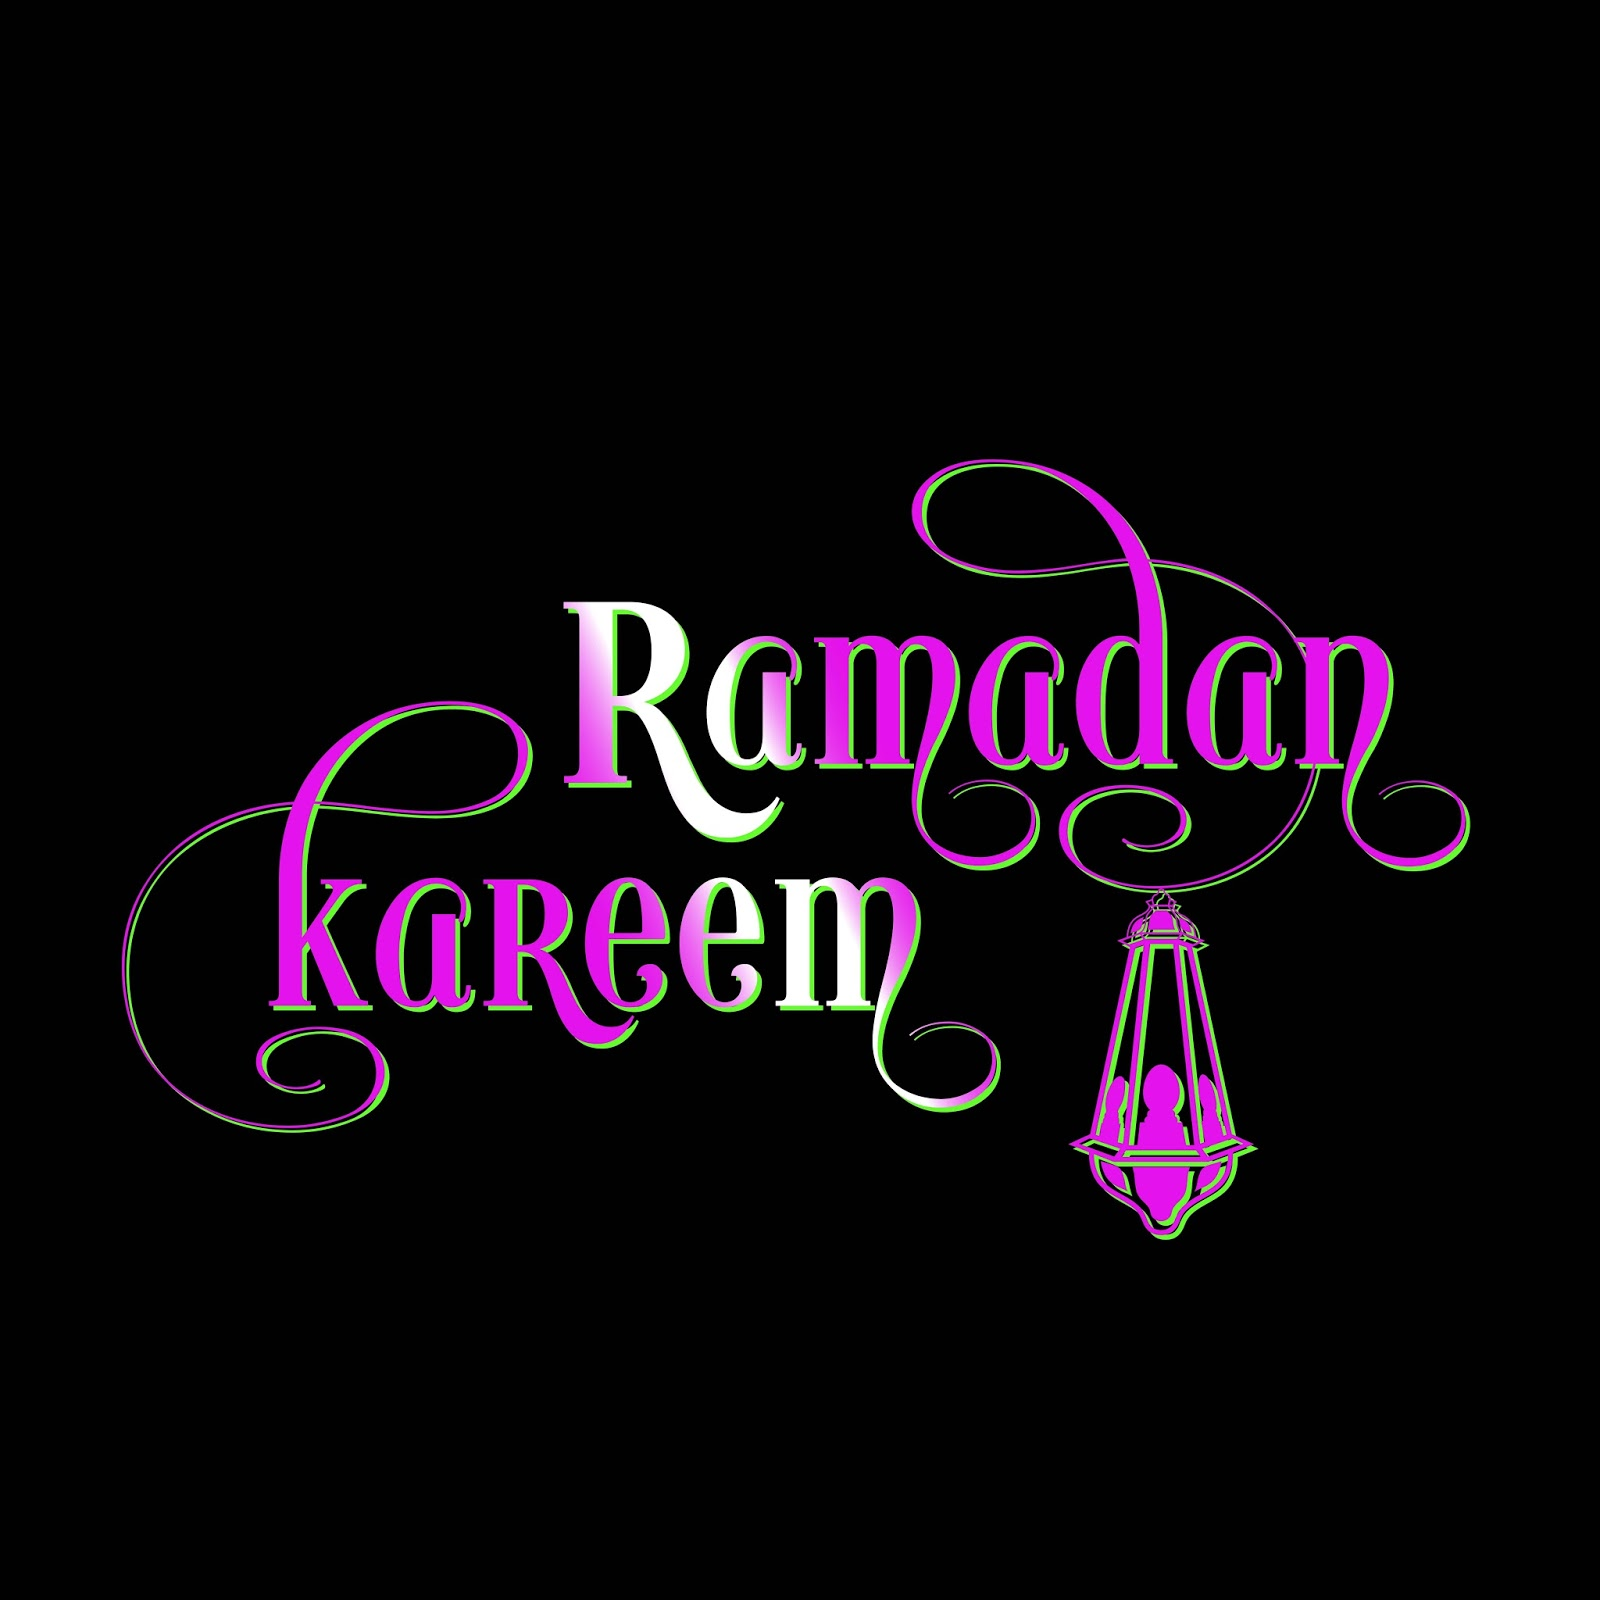 Shayari urdu imagesurdu shayari with pictureurdu shayari wallpaper ramadan kareem wishes greetings messages 2016 m4hsunfo